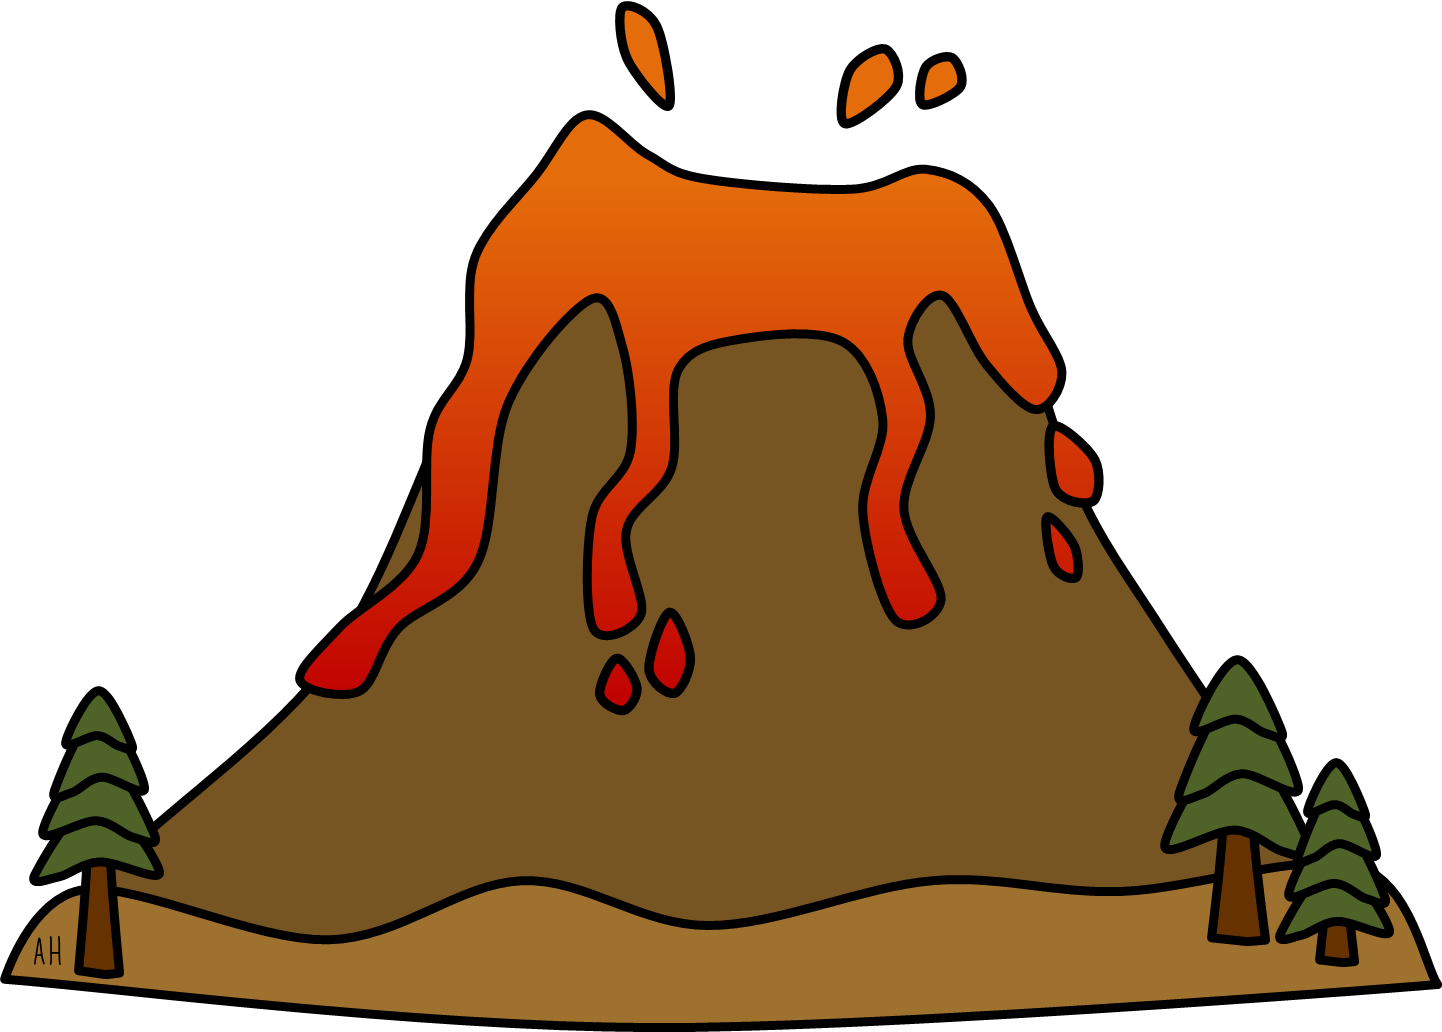 volcano clipart - Volcano Clip Art